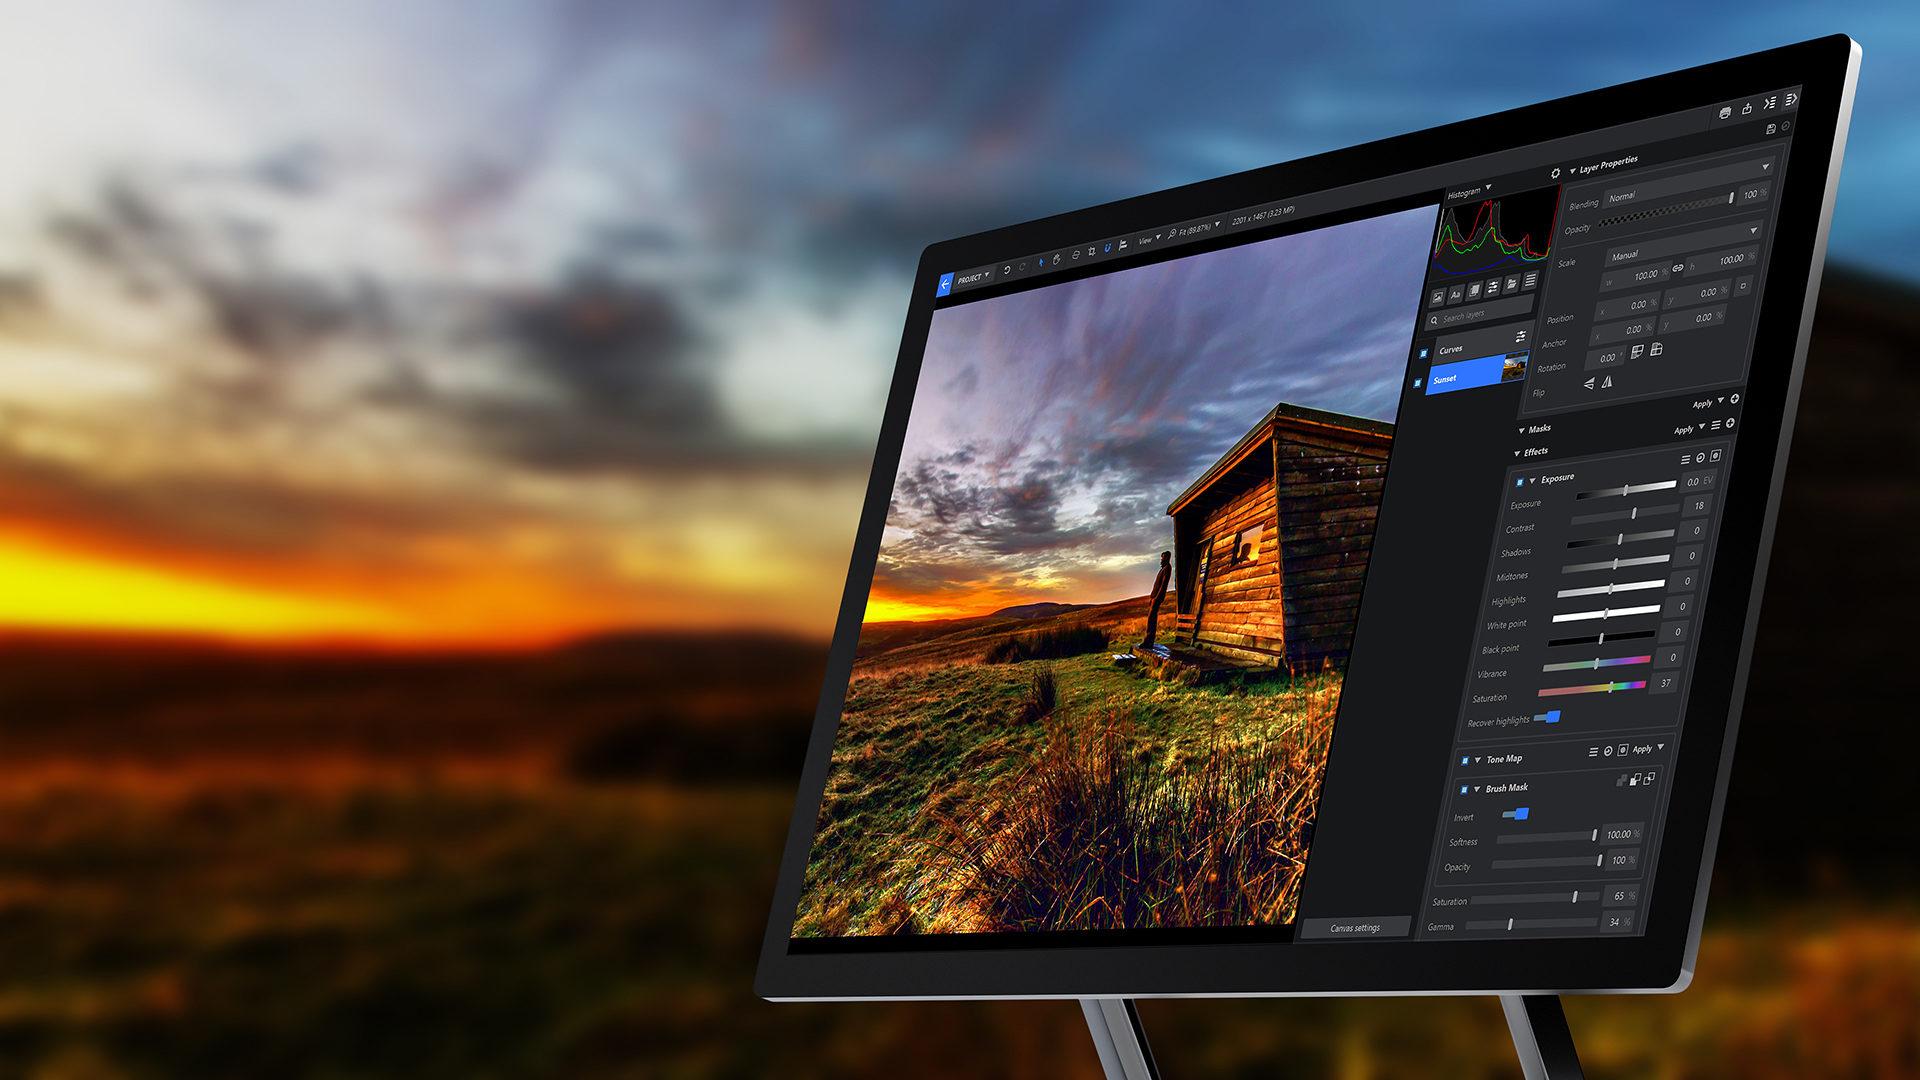 Imerge Pro 7 interface on desktop PC monitor - Imerge Pro 7 Release